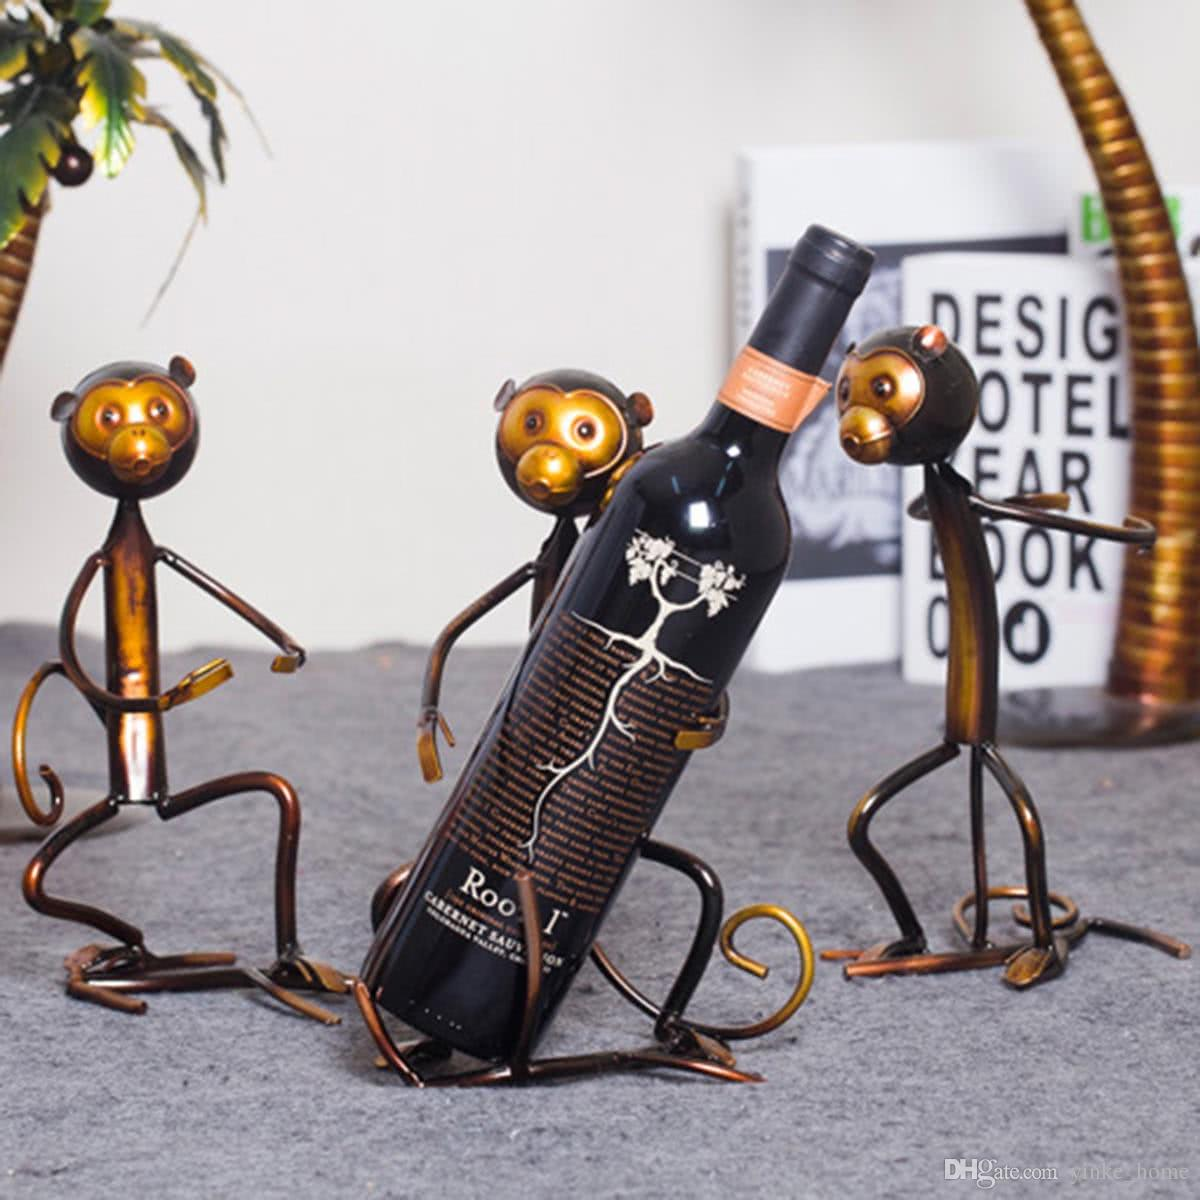 2019 Modern Handcrafts Metal Art Monkey Shaped Figurines Wine Rack